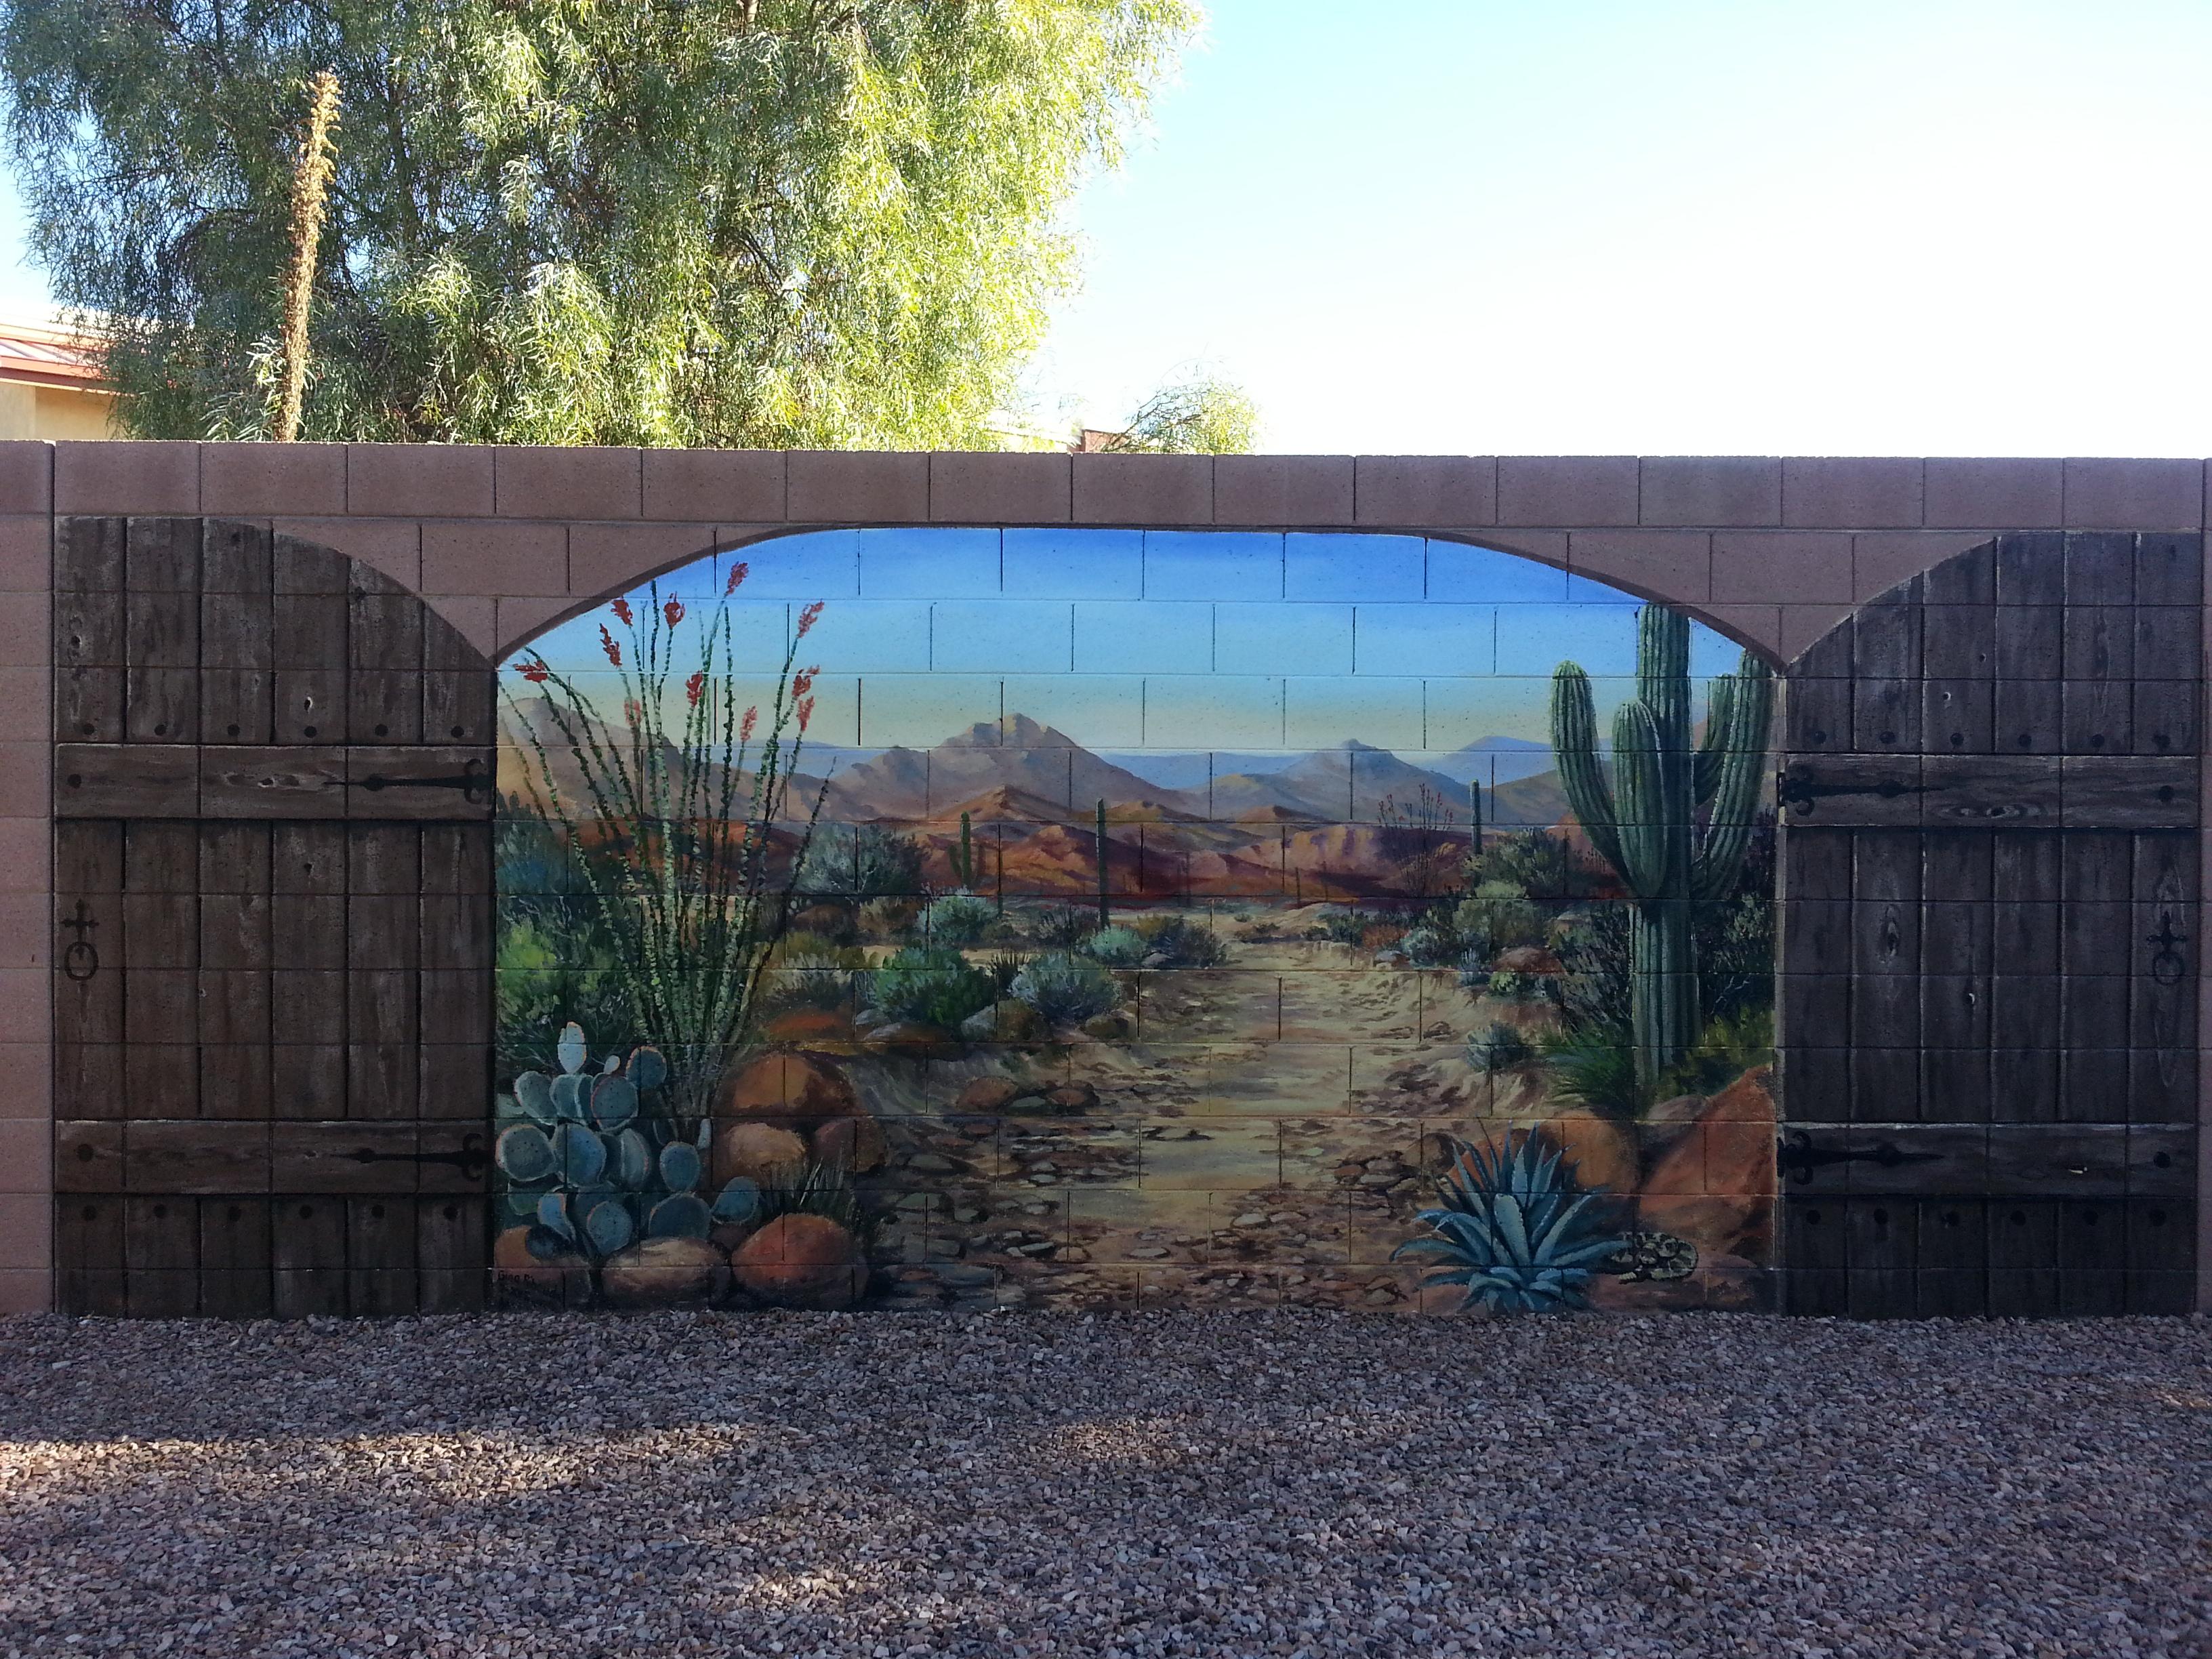 arizona block wall murals gallery i love murals by gina ribaudo